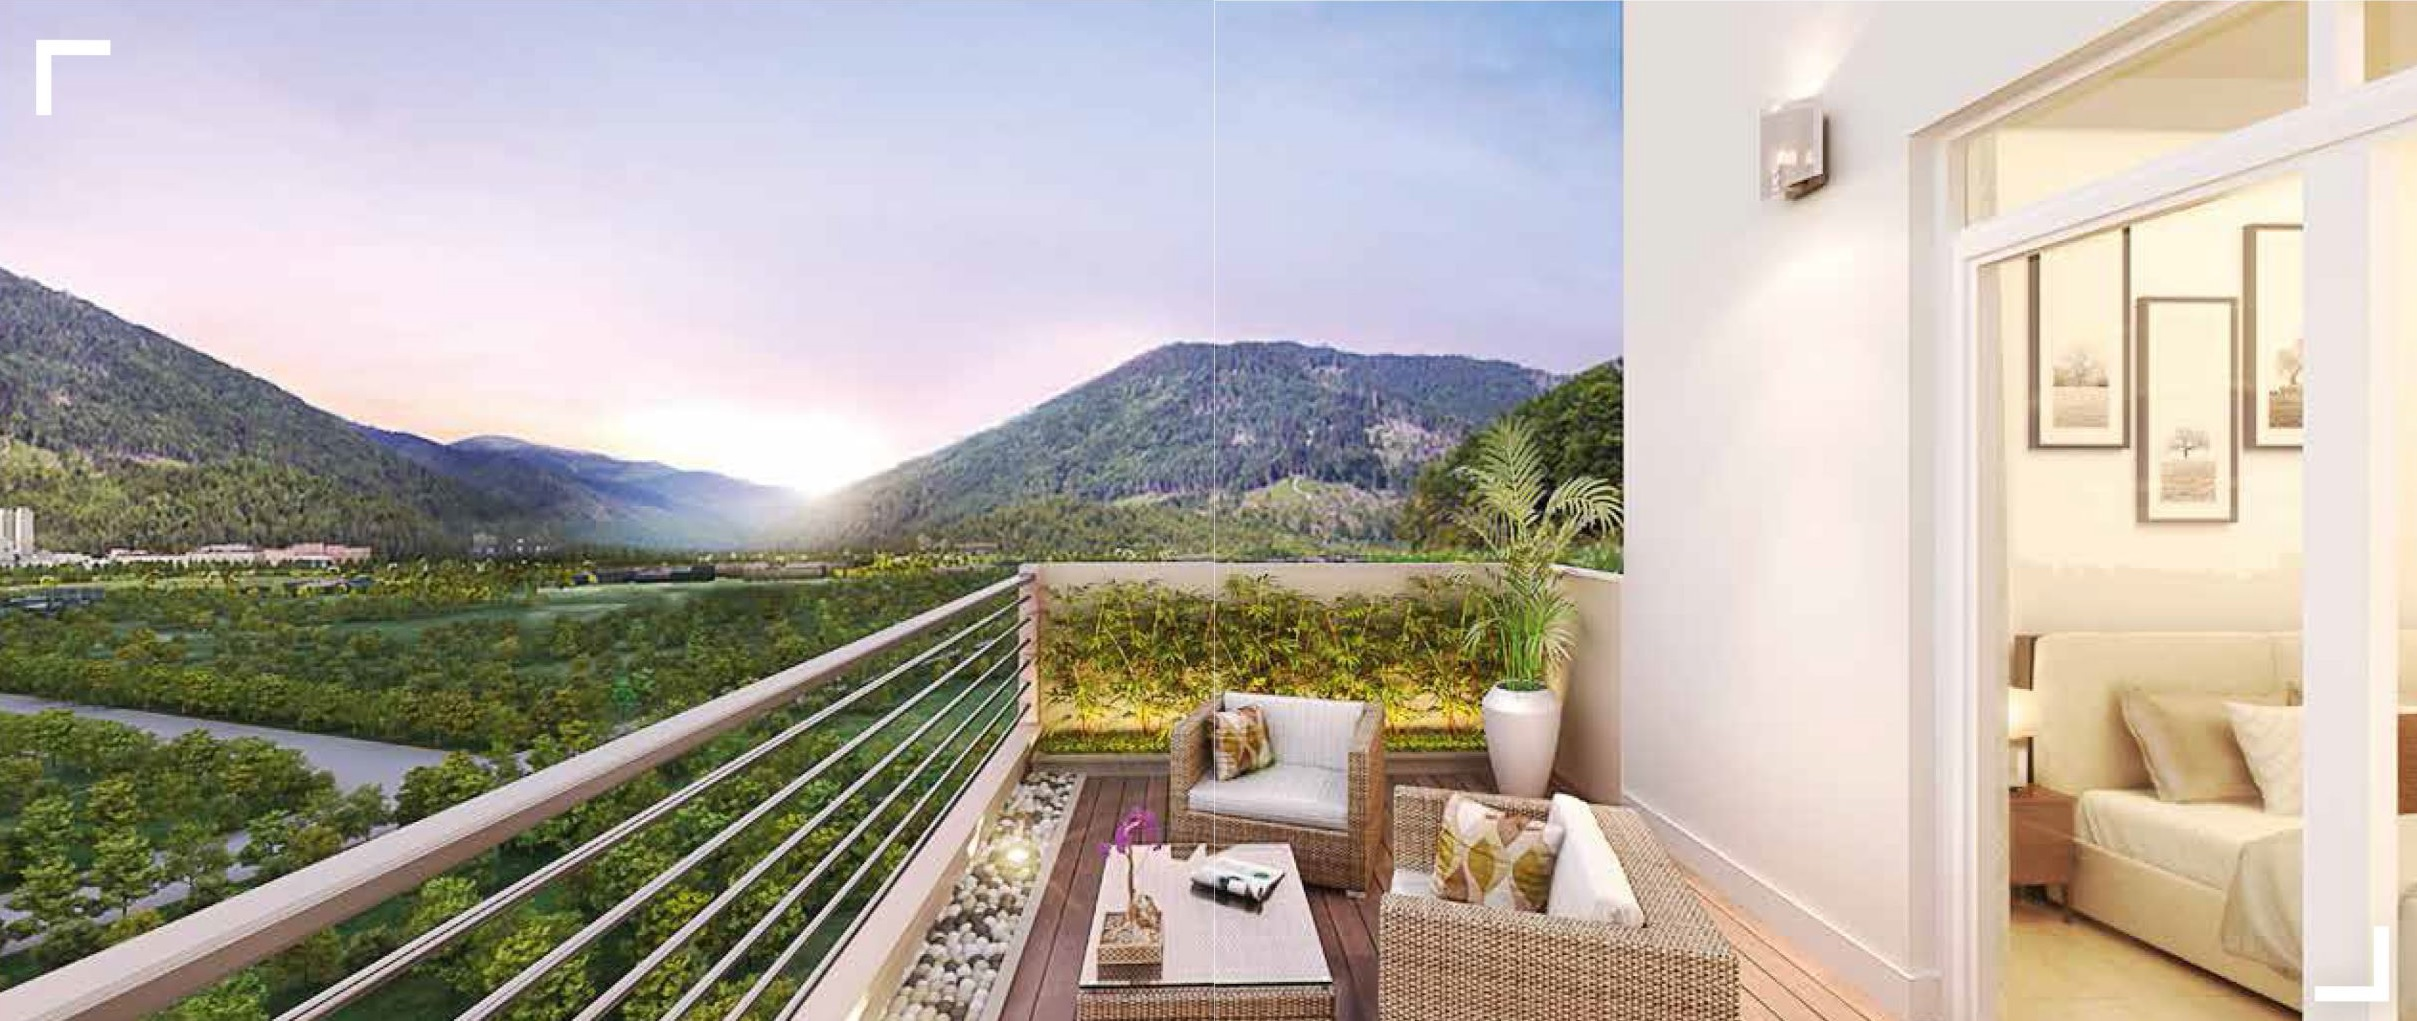 godrej aria amenities features8